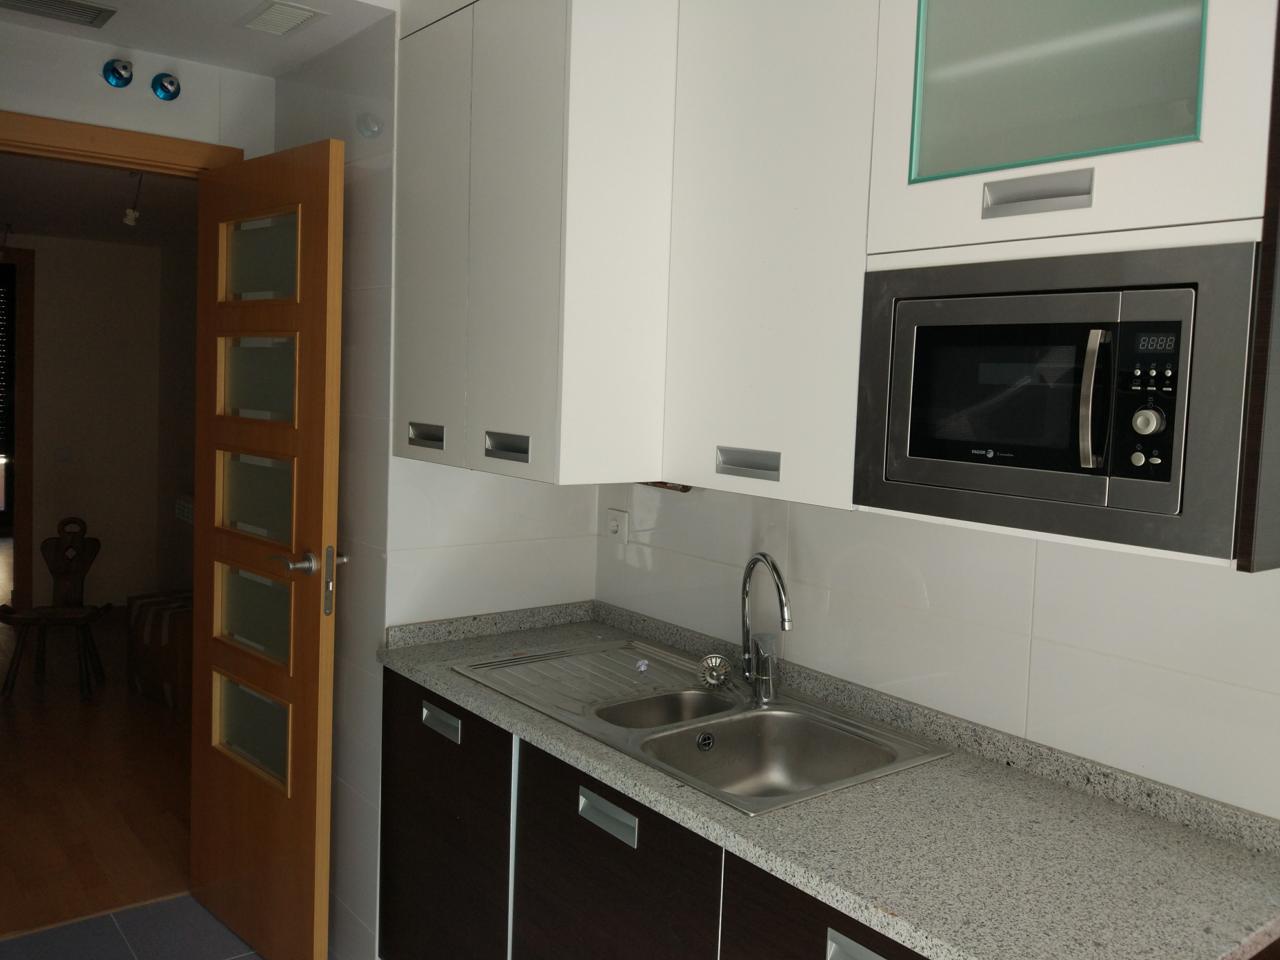 piso inversores con inquilino obra nueva zaragoza|publipisos inmobiliarias-2